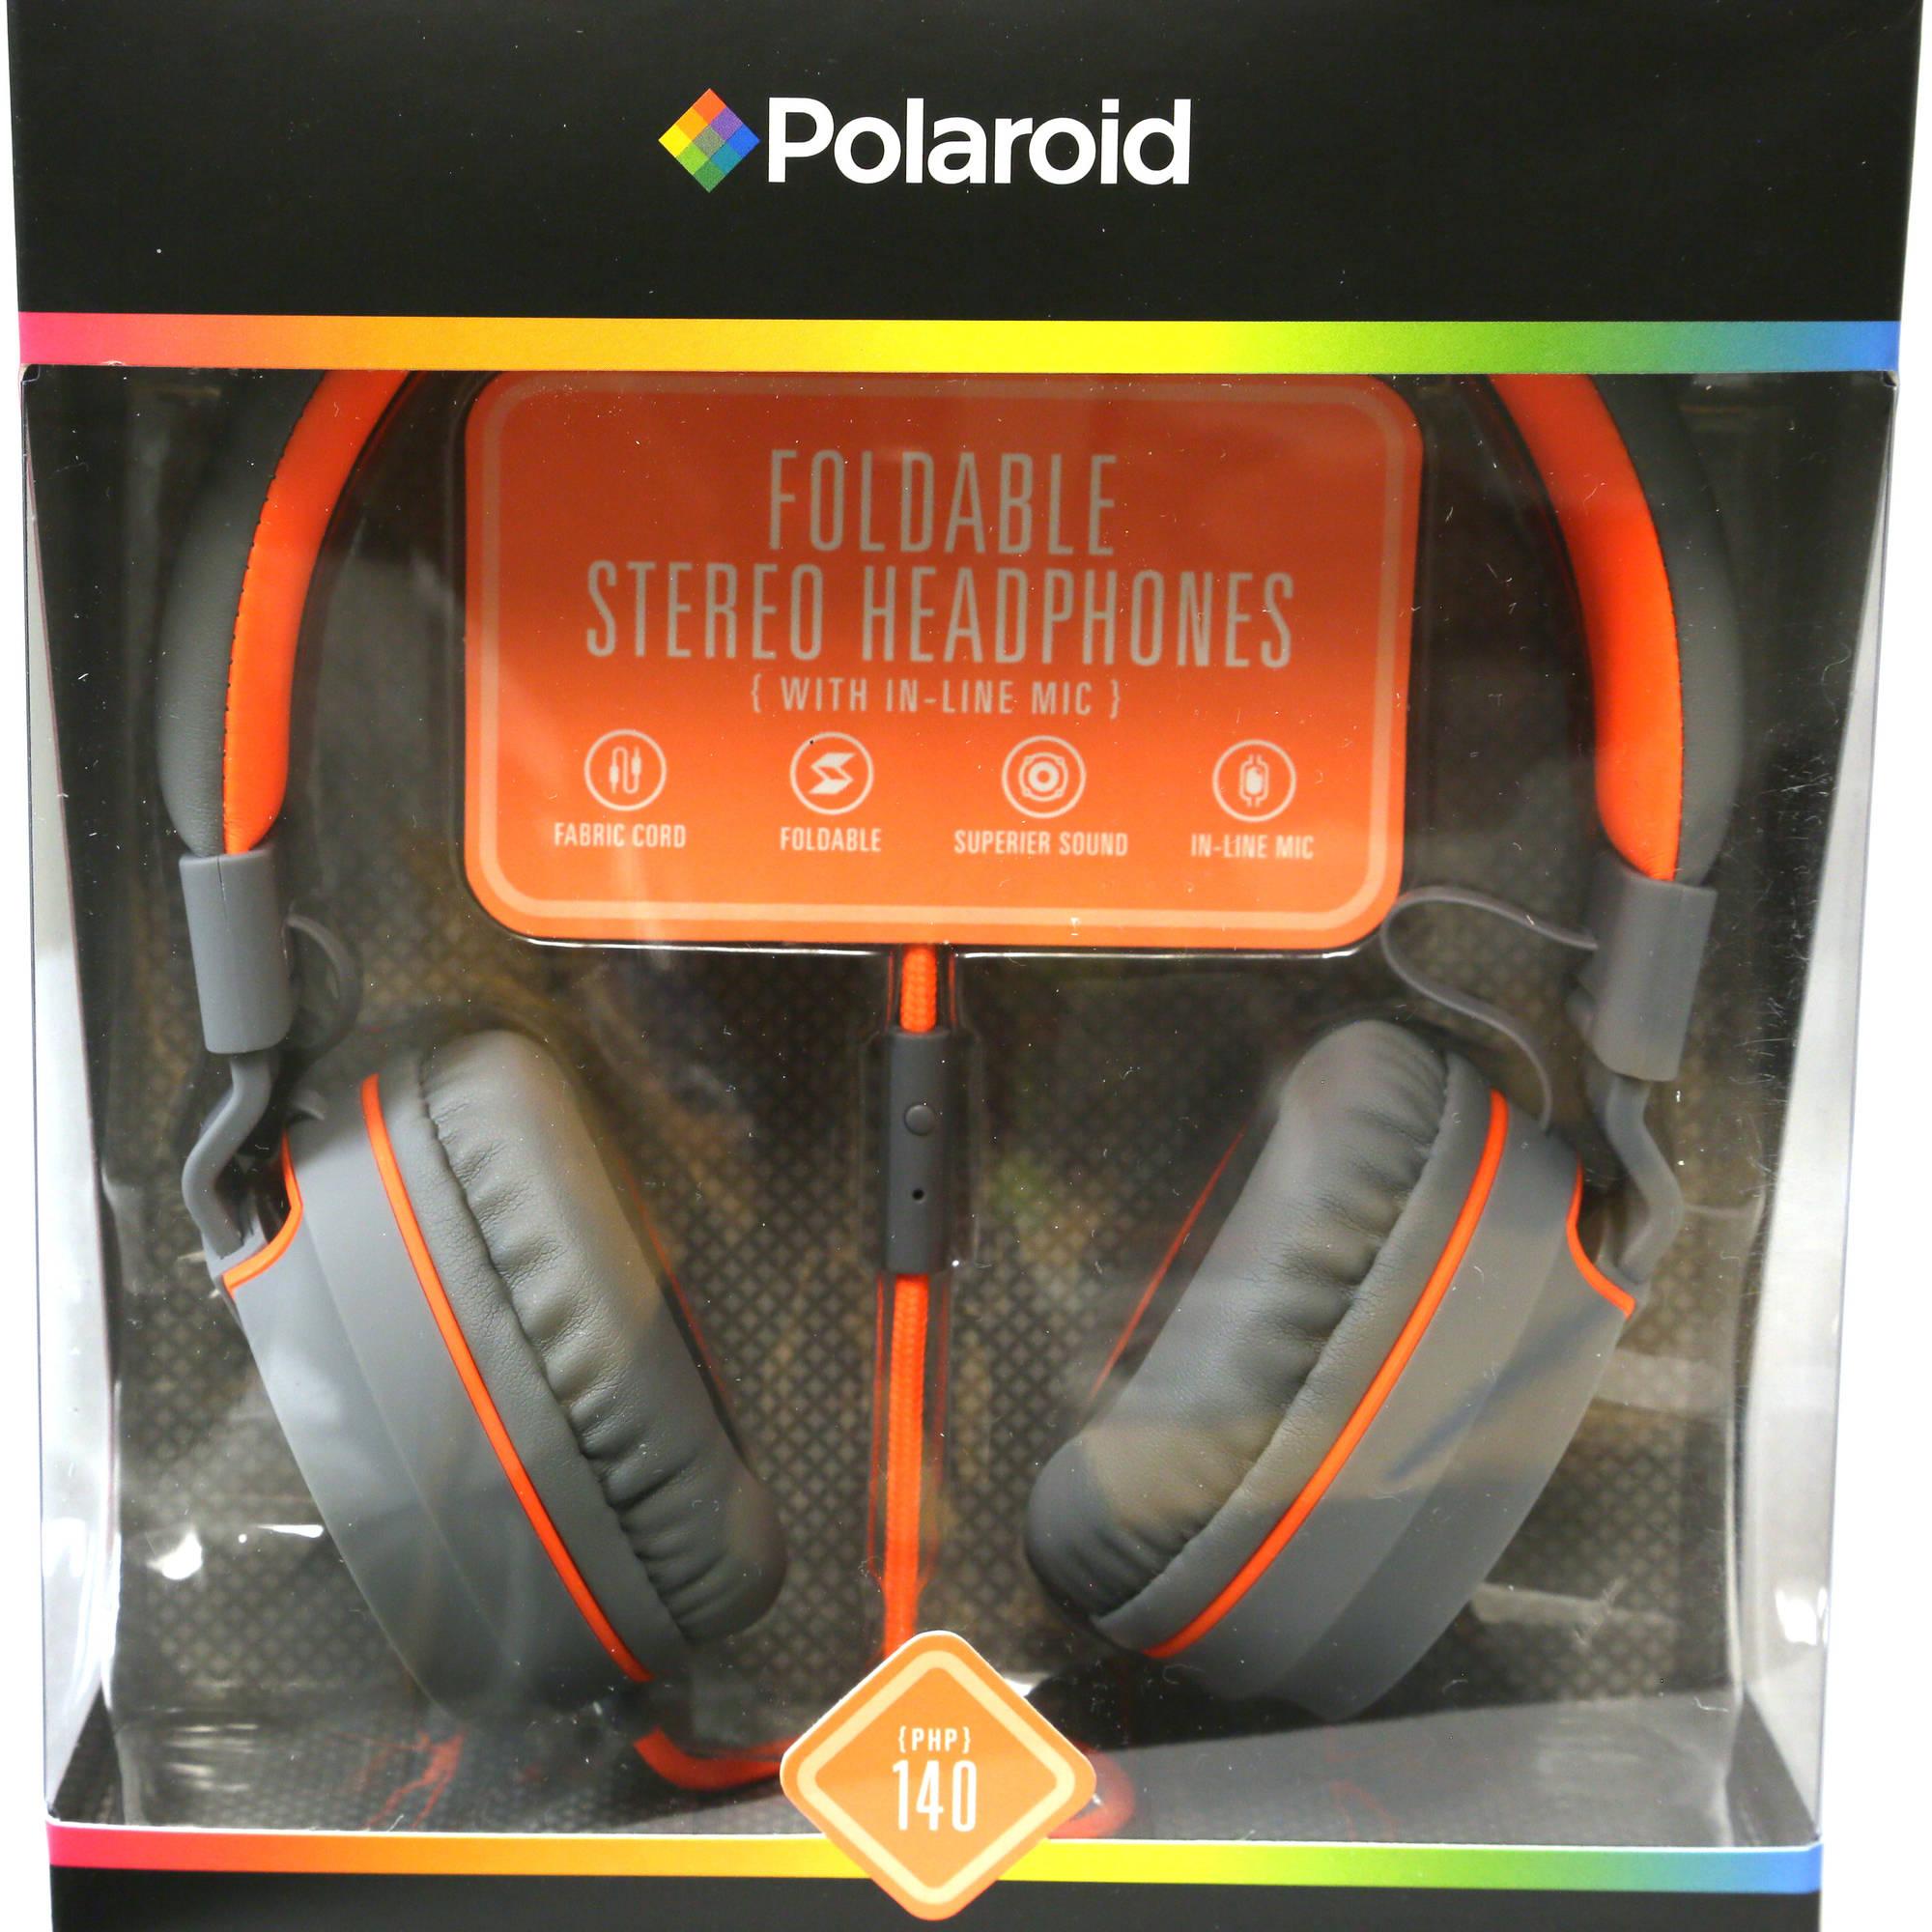 Polaroid PHP140 Foldable Headphones